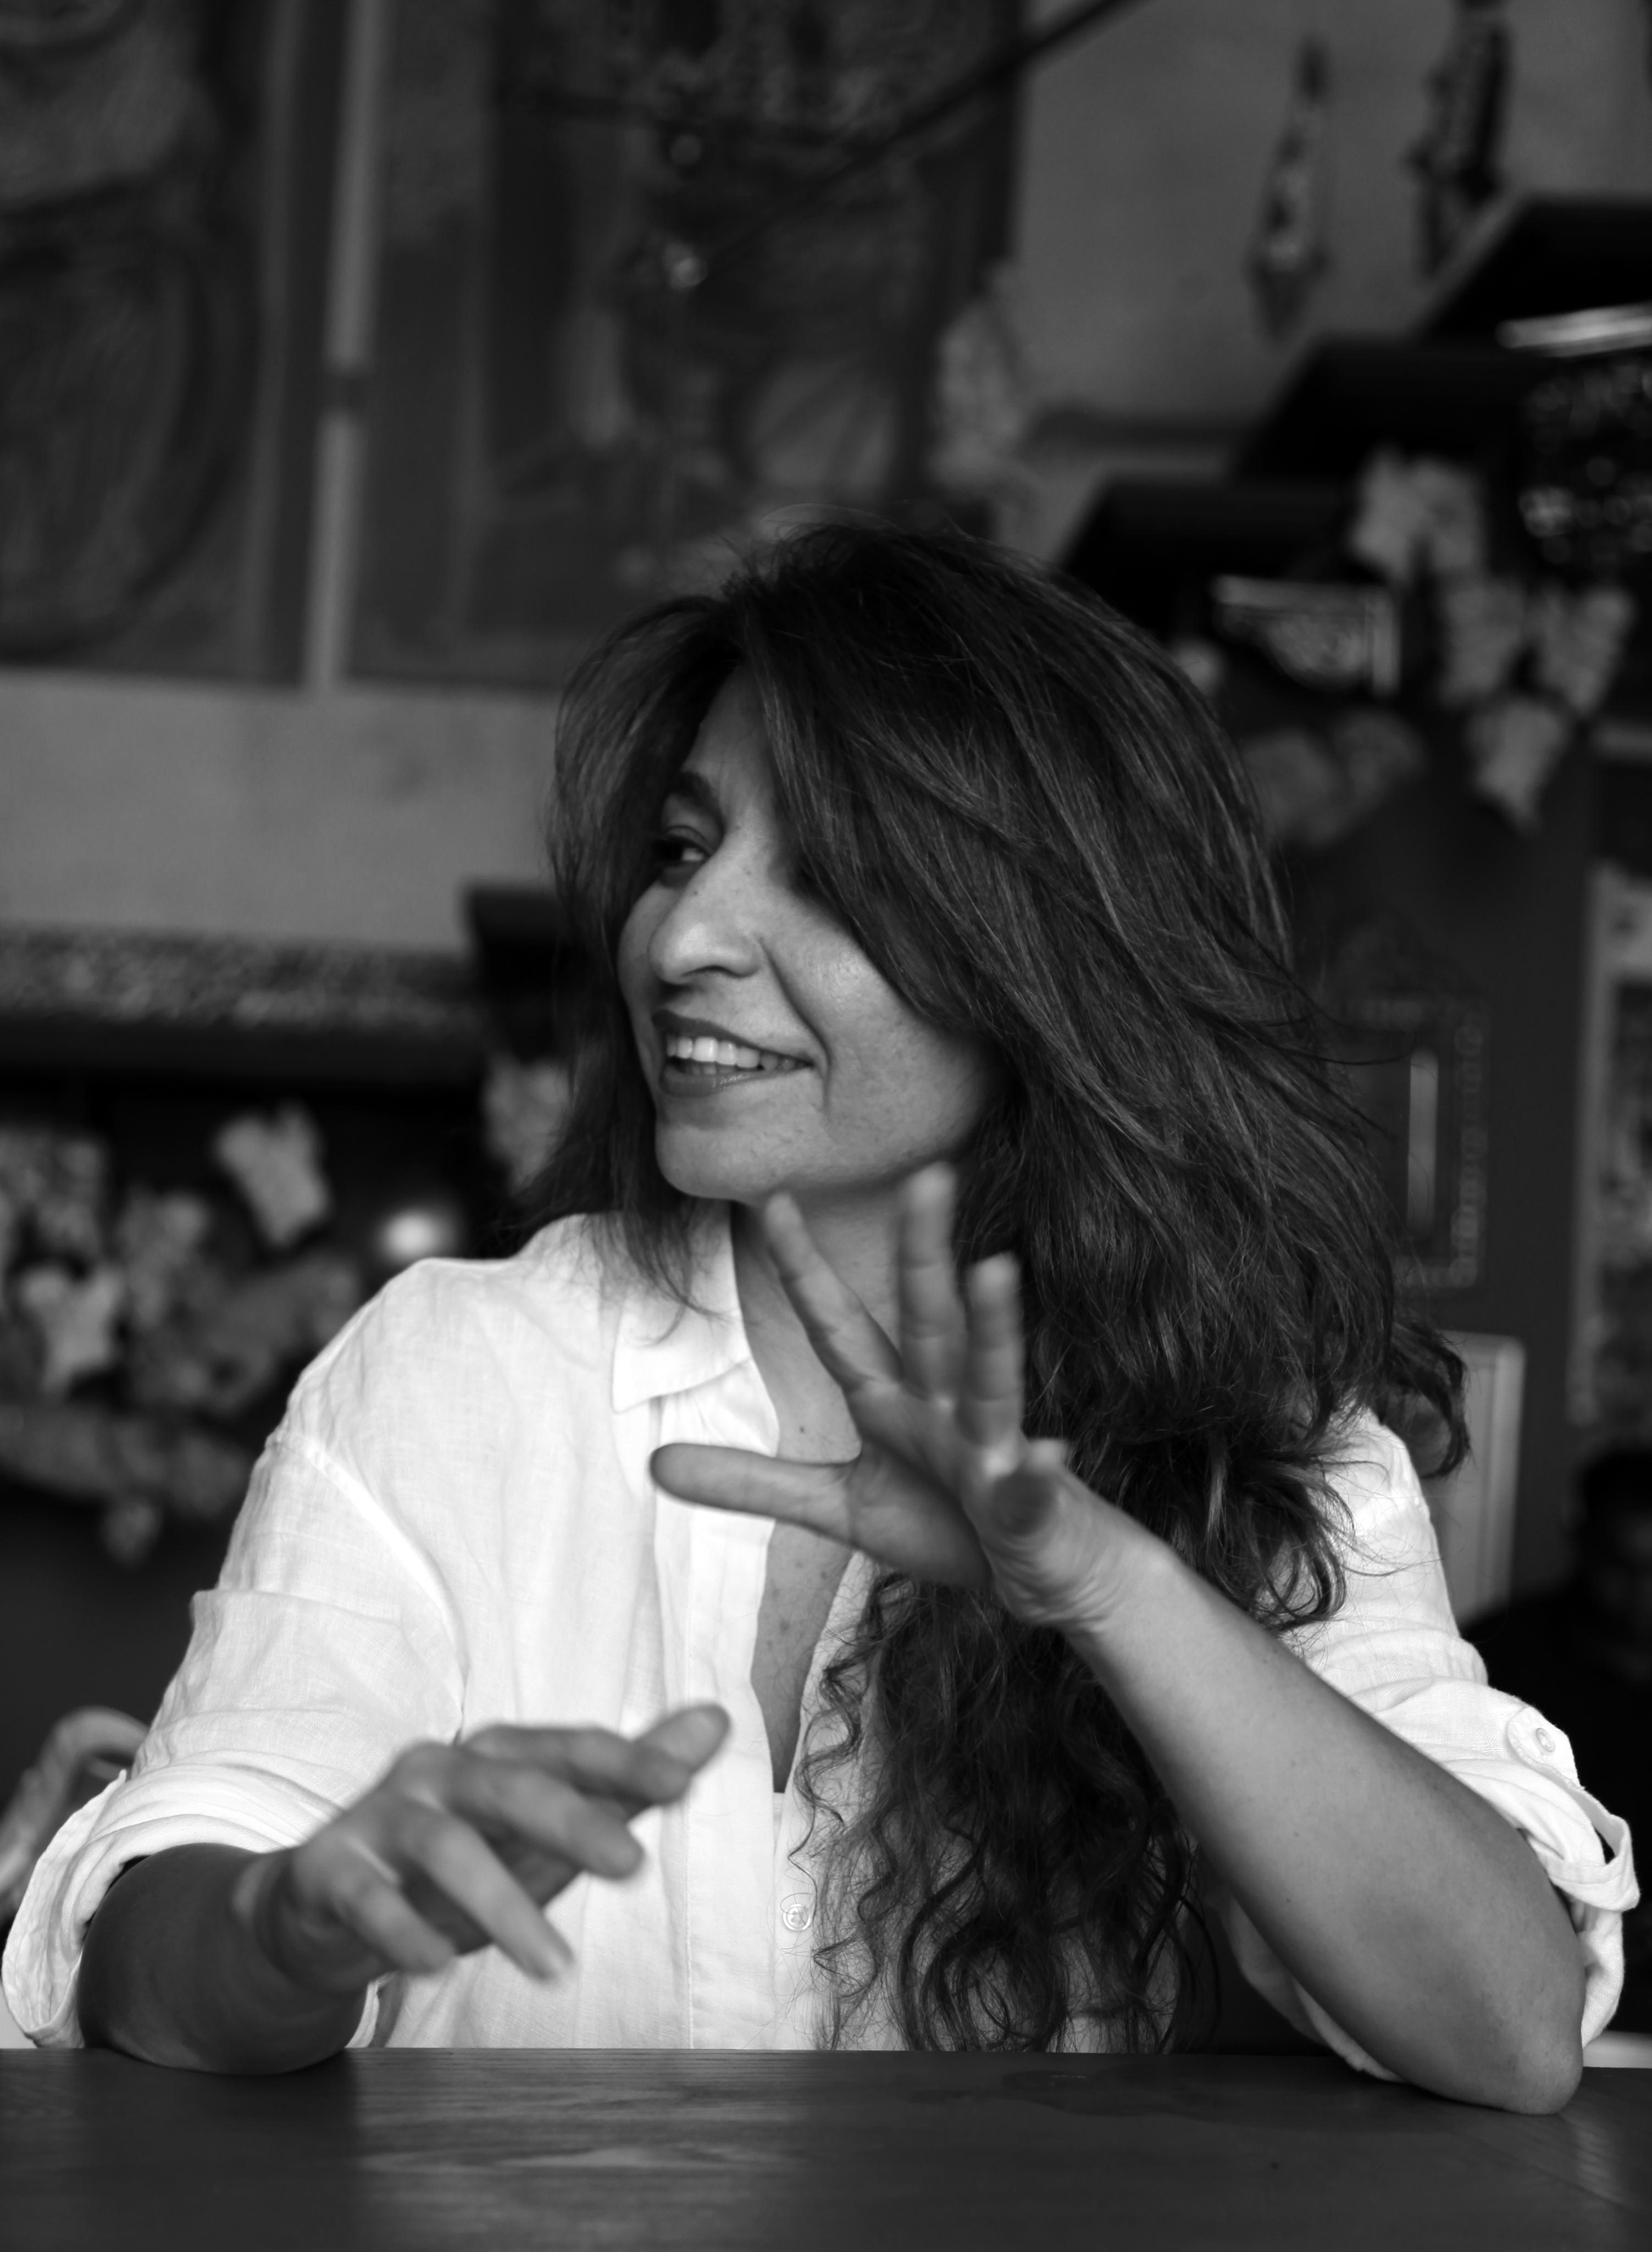 Author Nazli Ghassemi